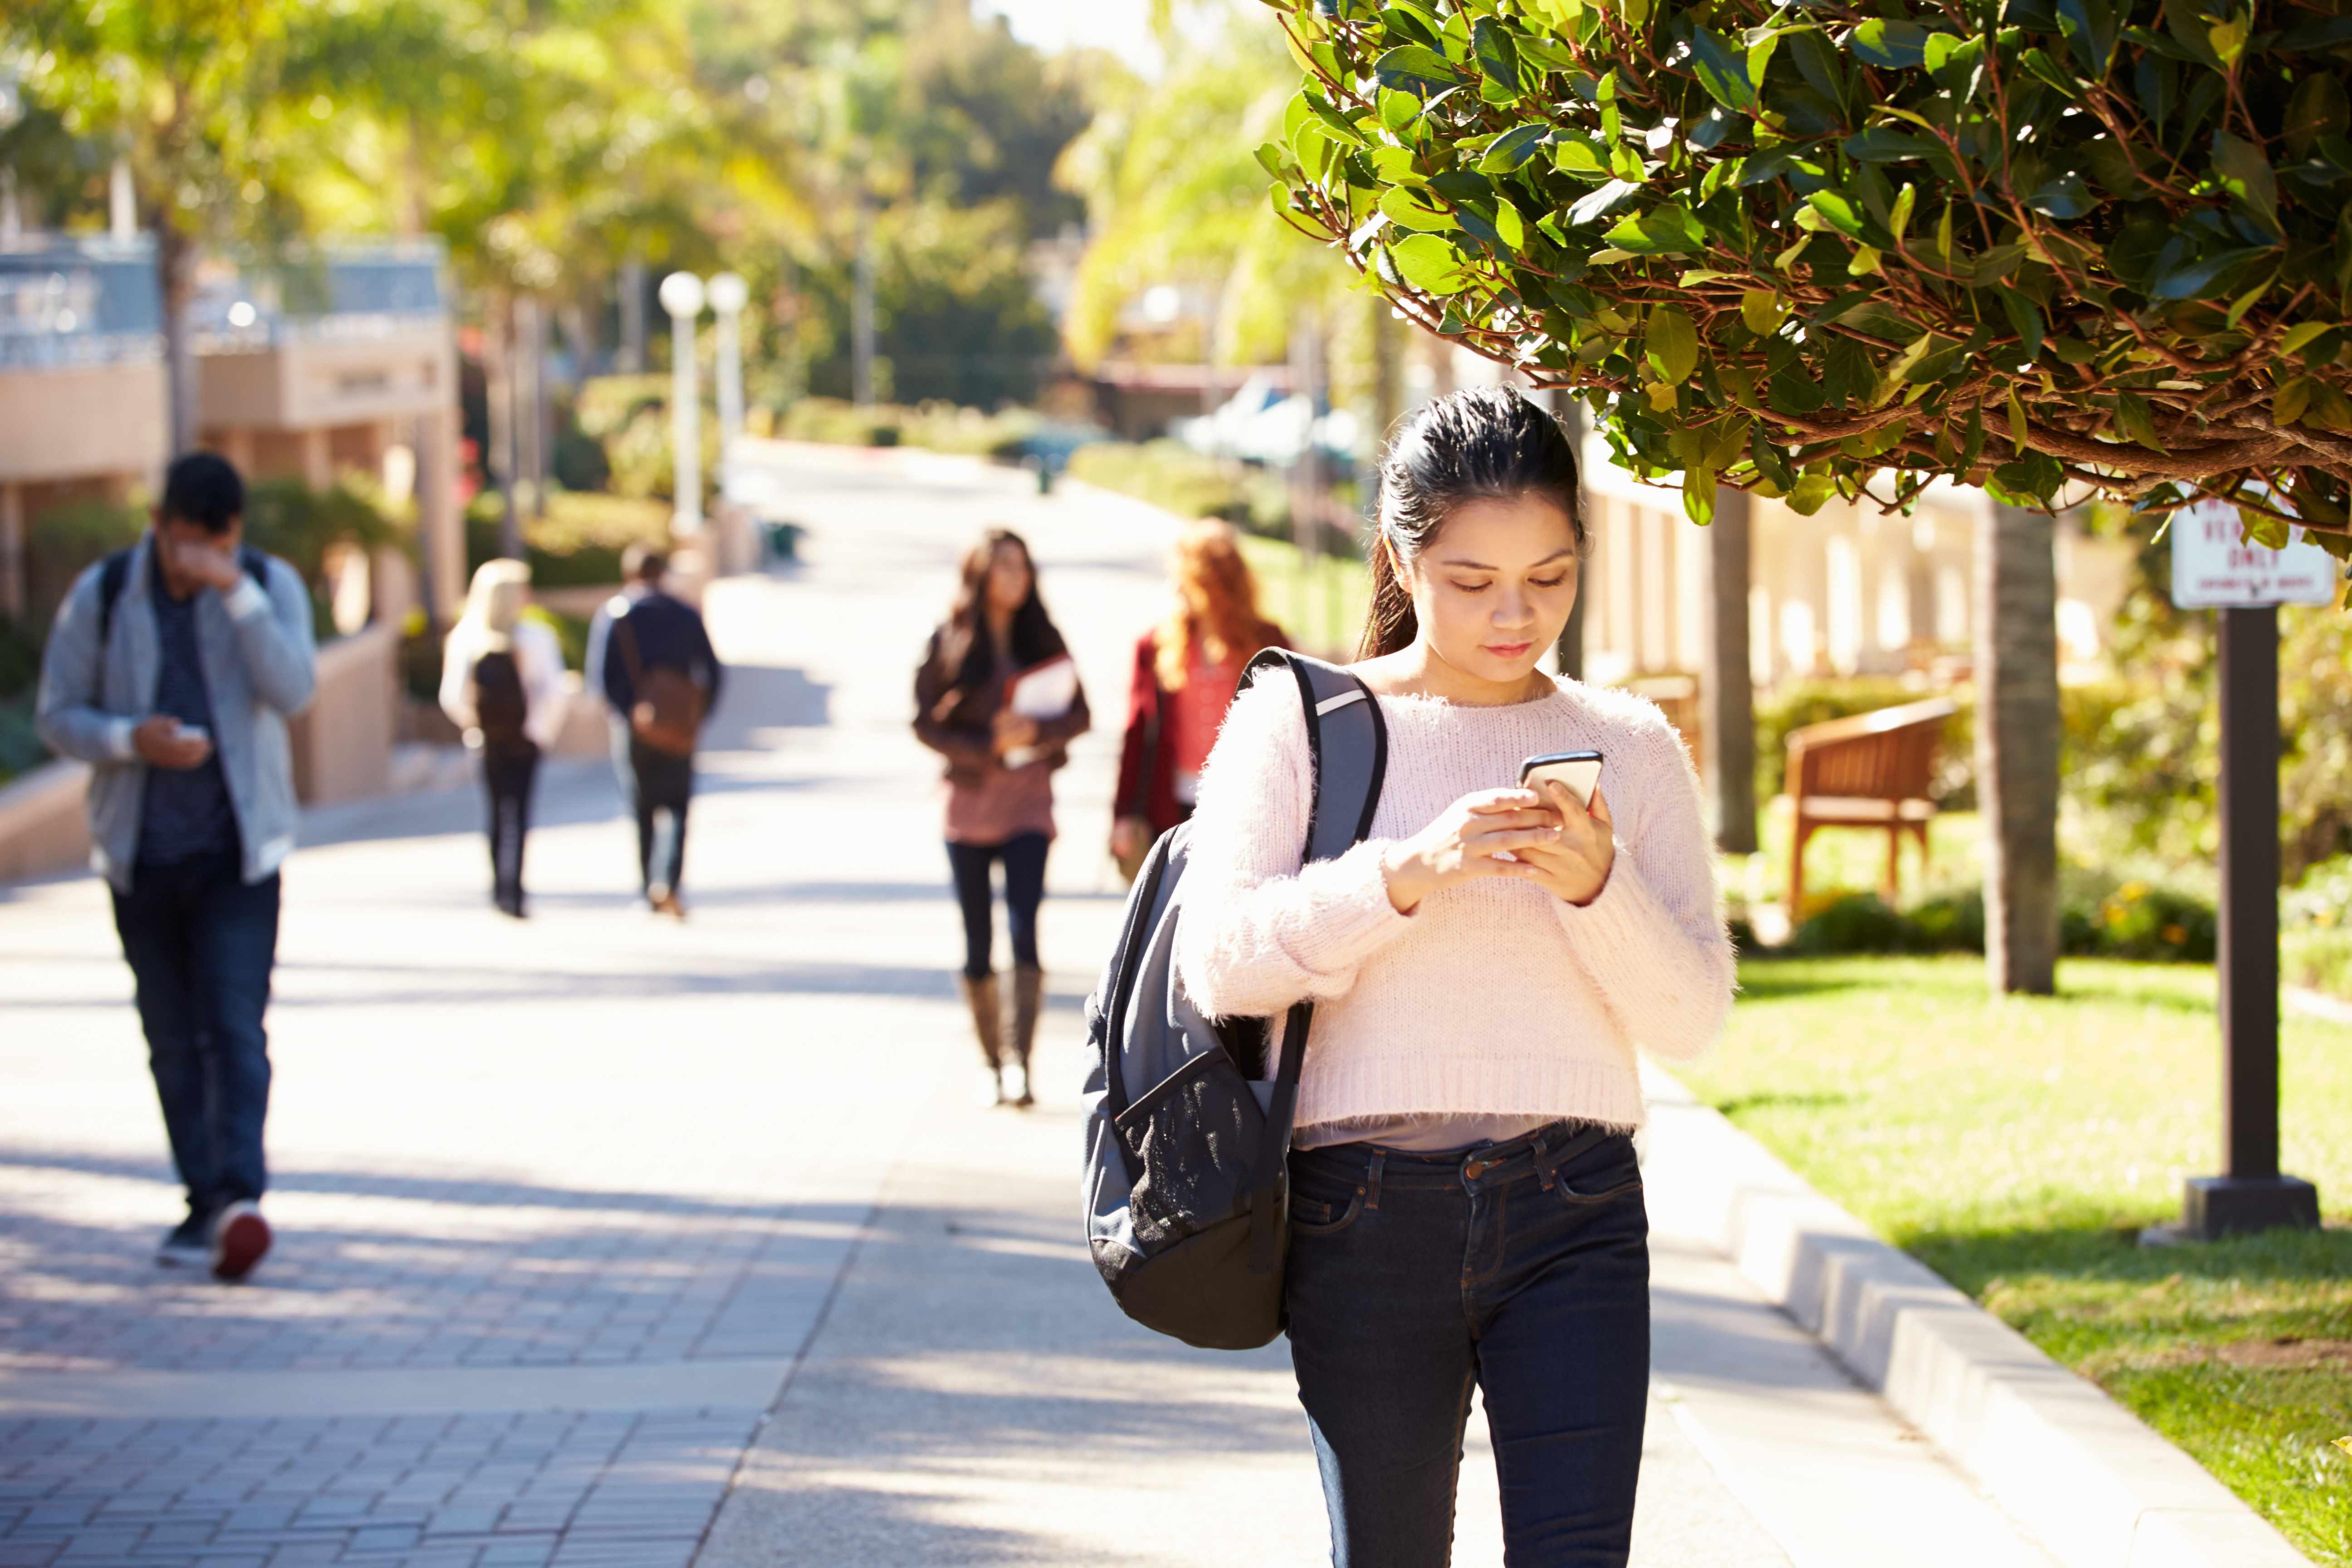 people walking on a sidewalk, some on their phones